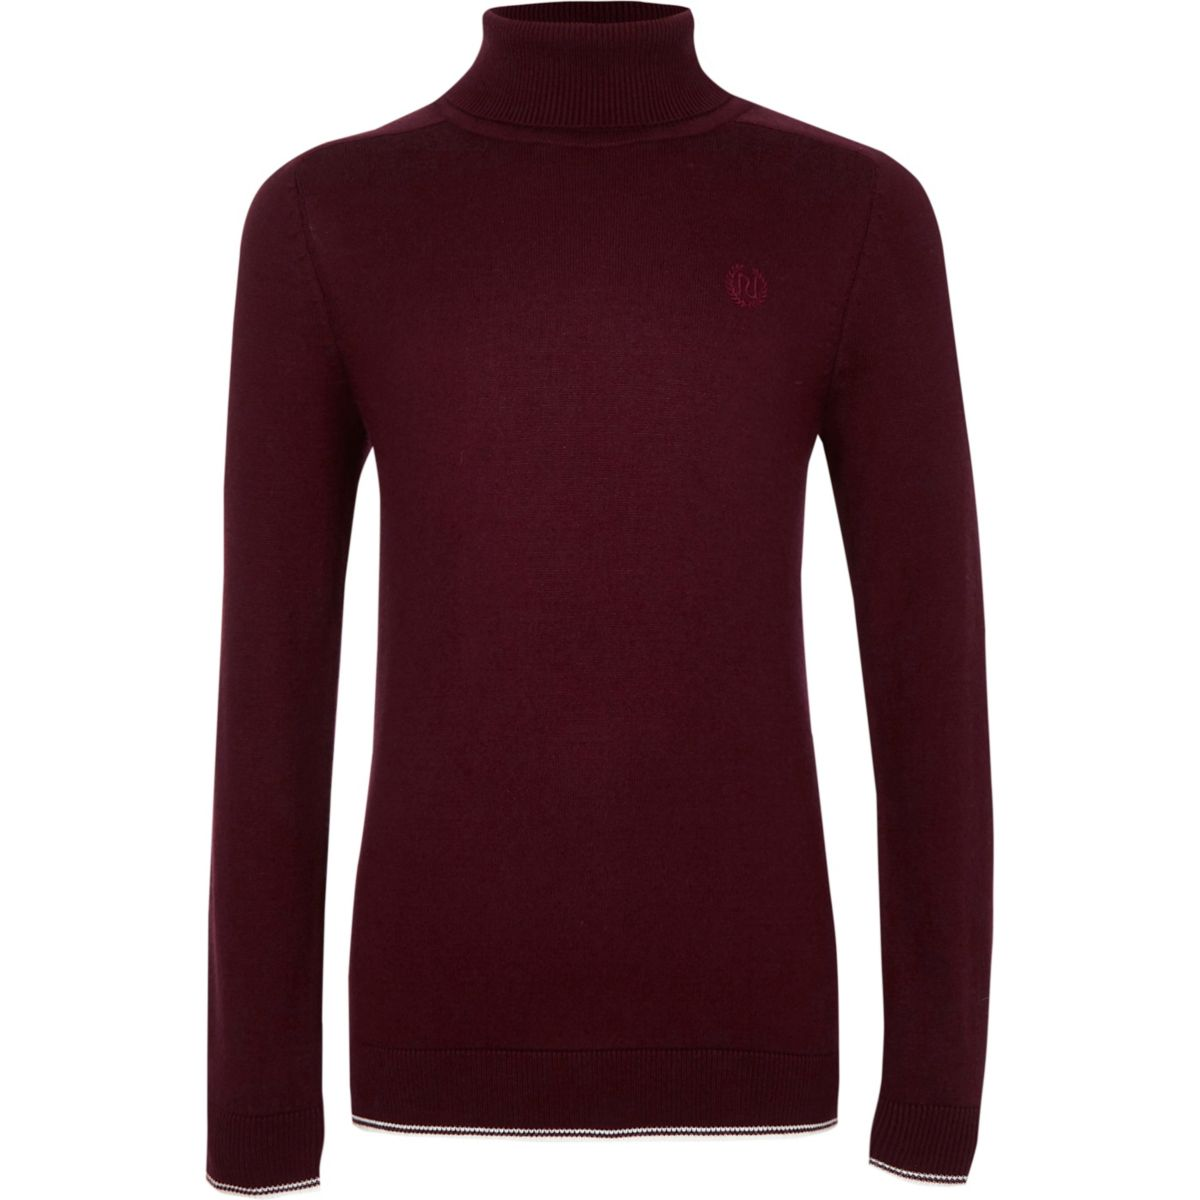 Boys dark red RI roll neck tipped sweater